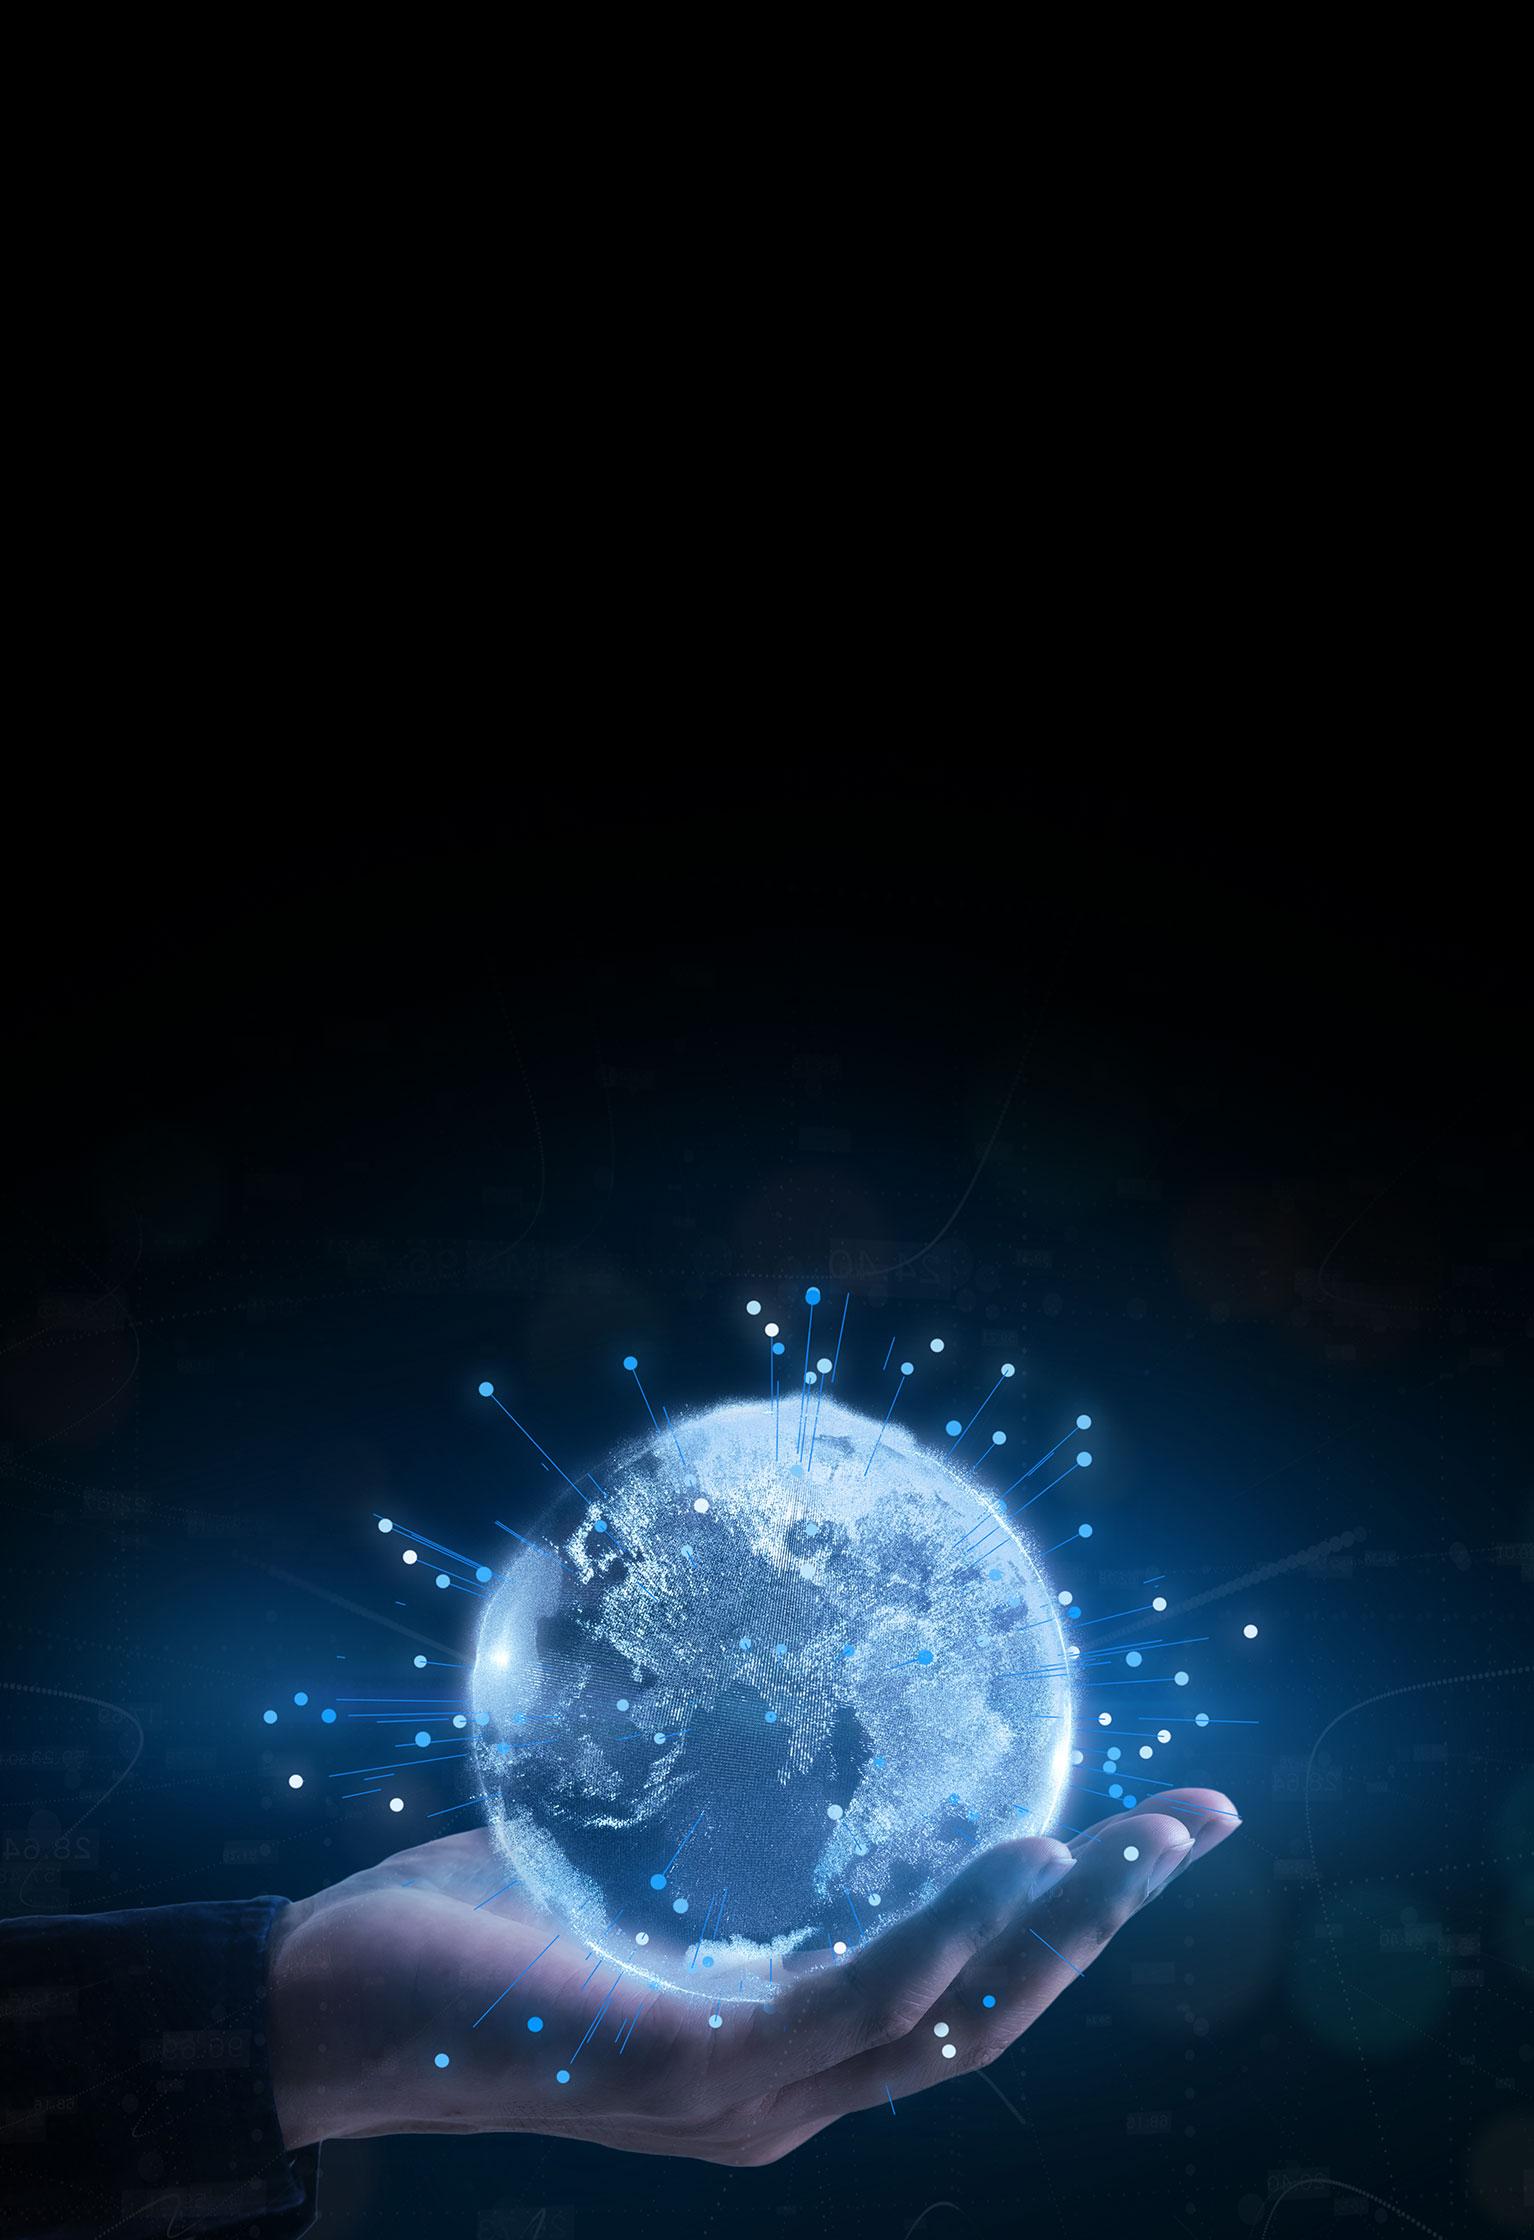 Illustration of hand holding a techno globe